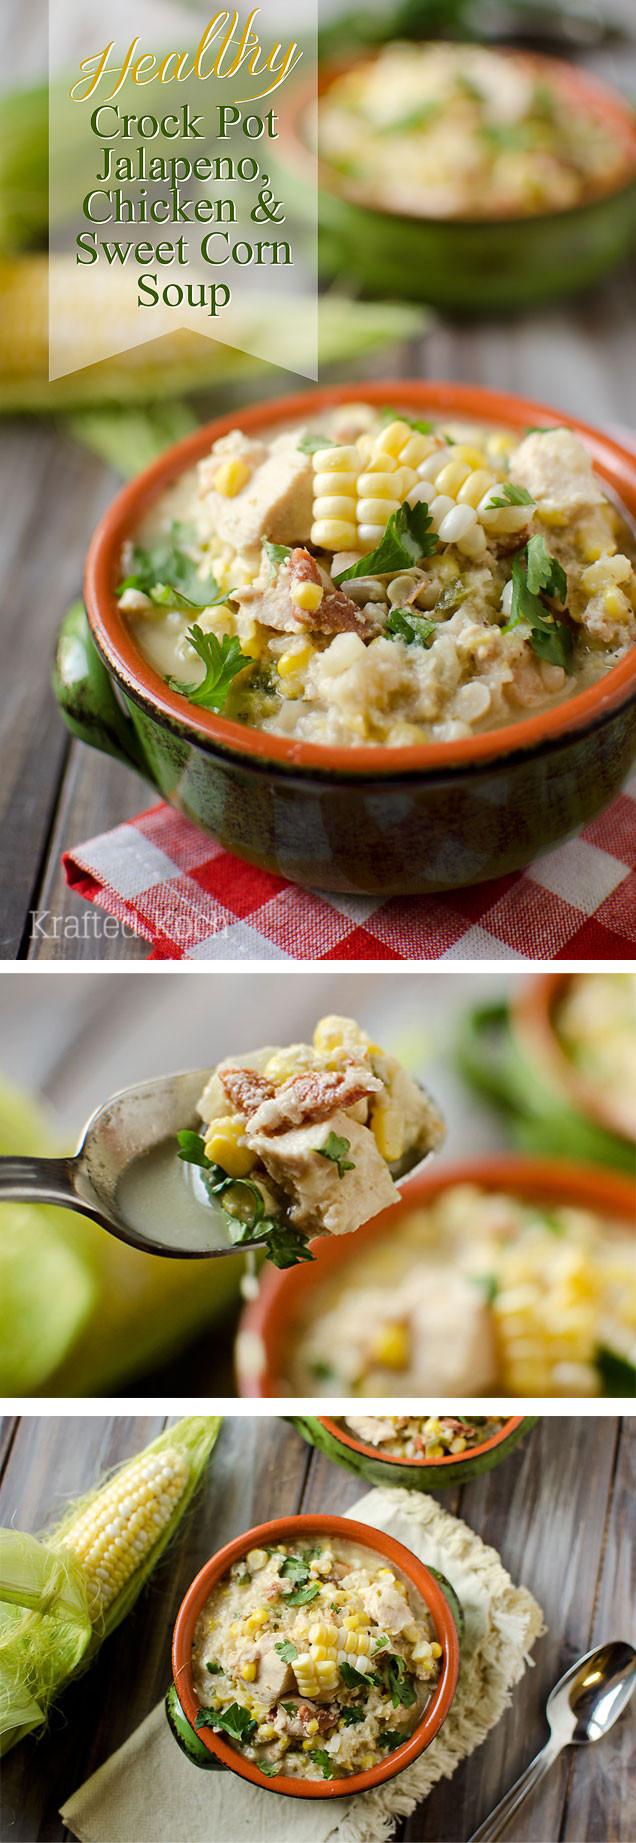 Crock Pot Soups Healthy  Healthy Crock Pot Jalapeno Chicken & Sweet Corn Soup